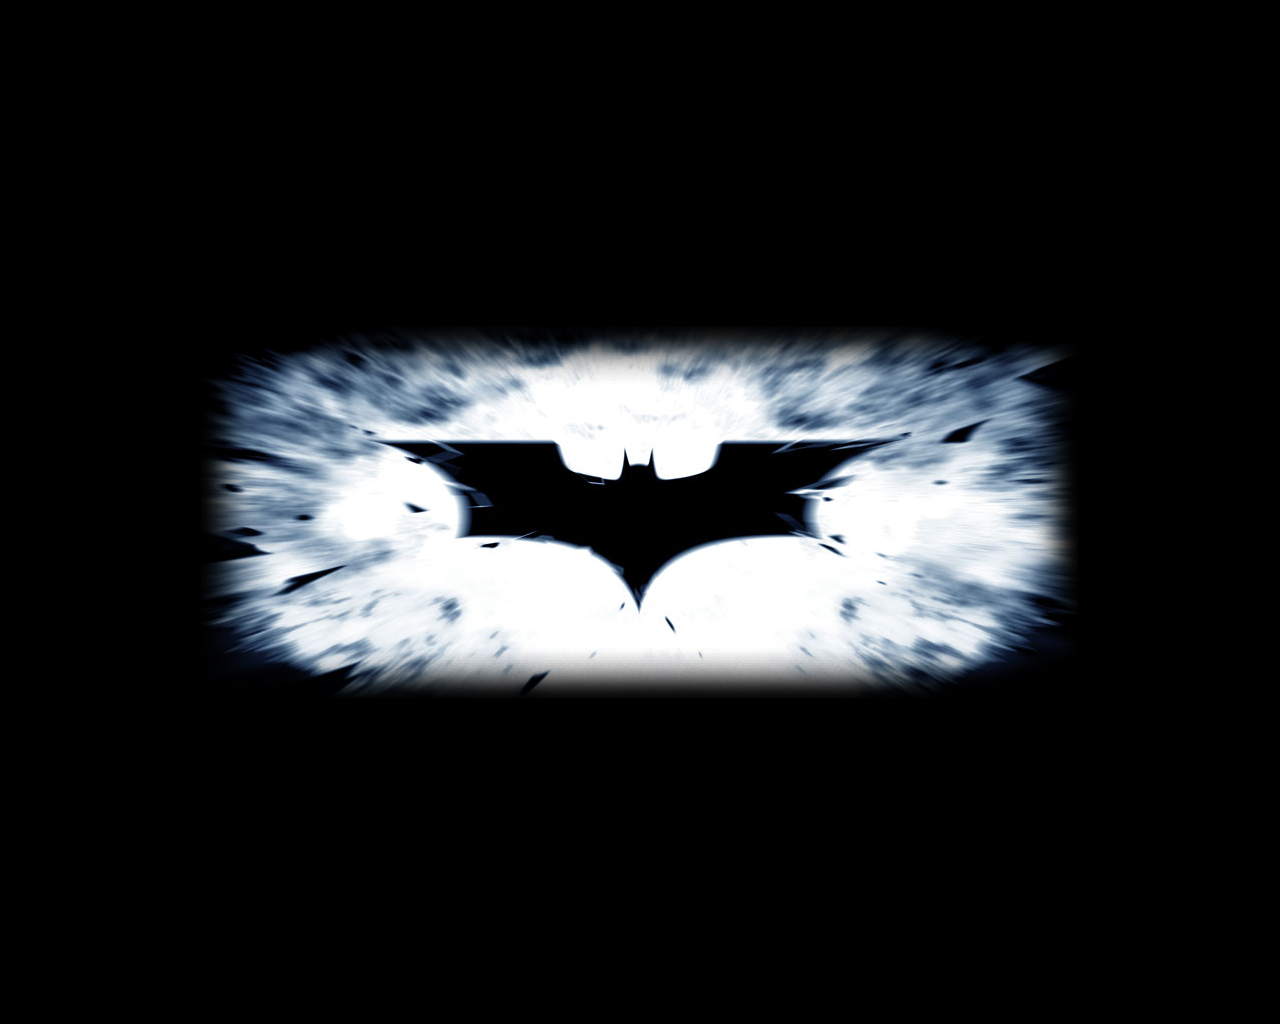 http://4.bp.blogspot.com/_kw1VD16J_Xw/R4O-oHWKpYI/AAAAAAAABJ0/qlBnt75Zk20/s1600/Batman_Logo.jpg